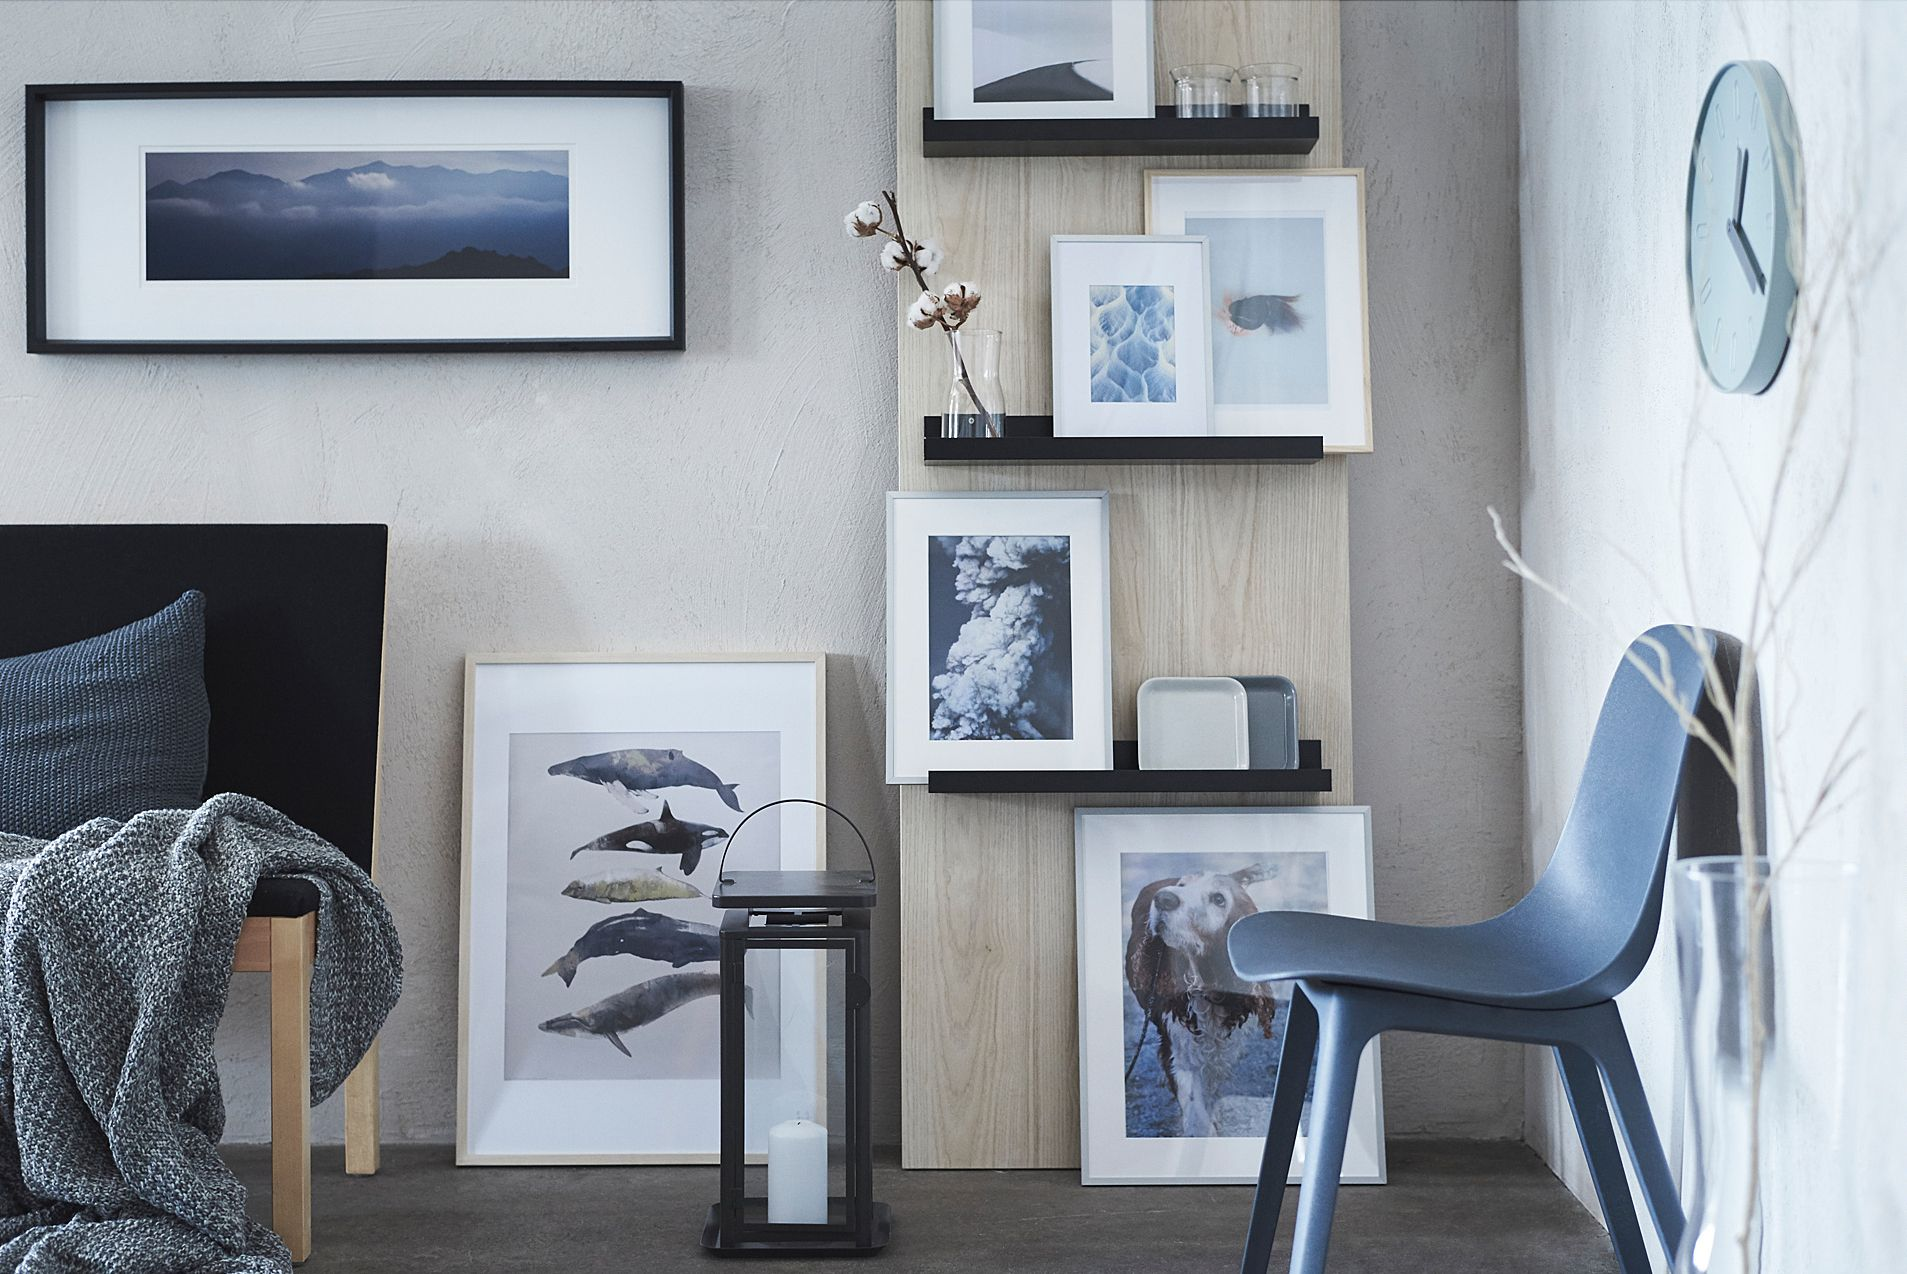 IKEA's New Chair Is Literally Trash Ikea, Restaurant